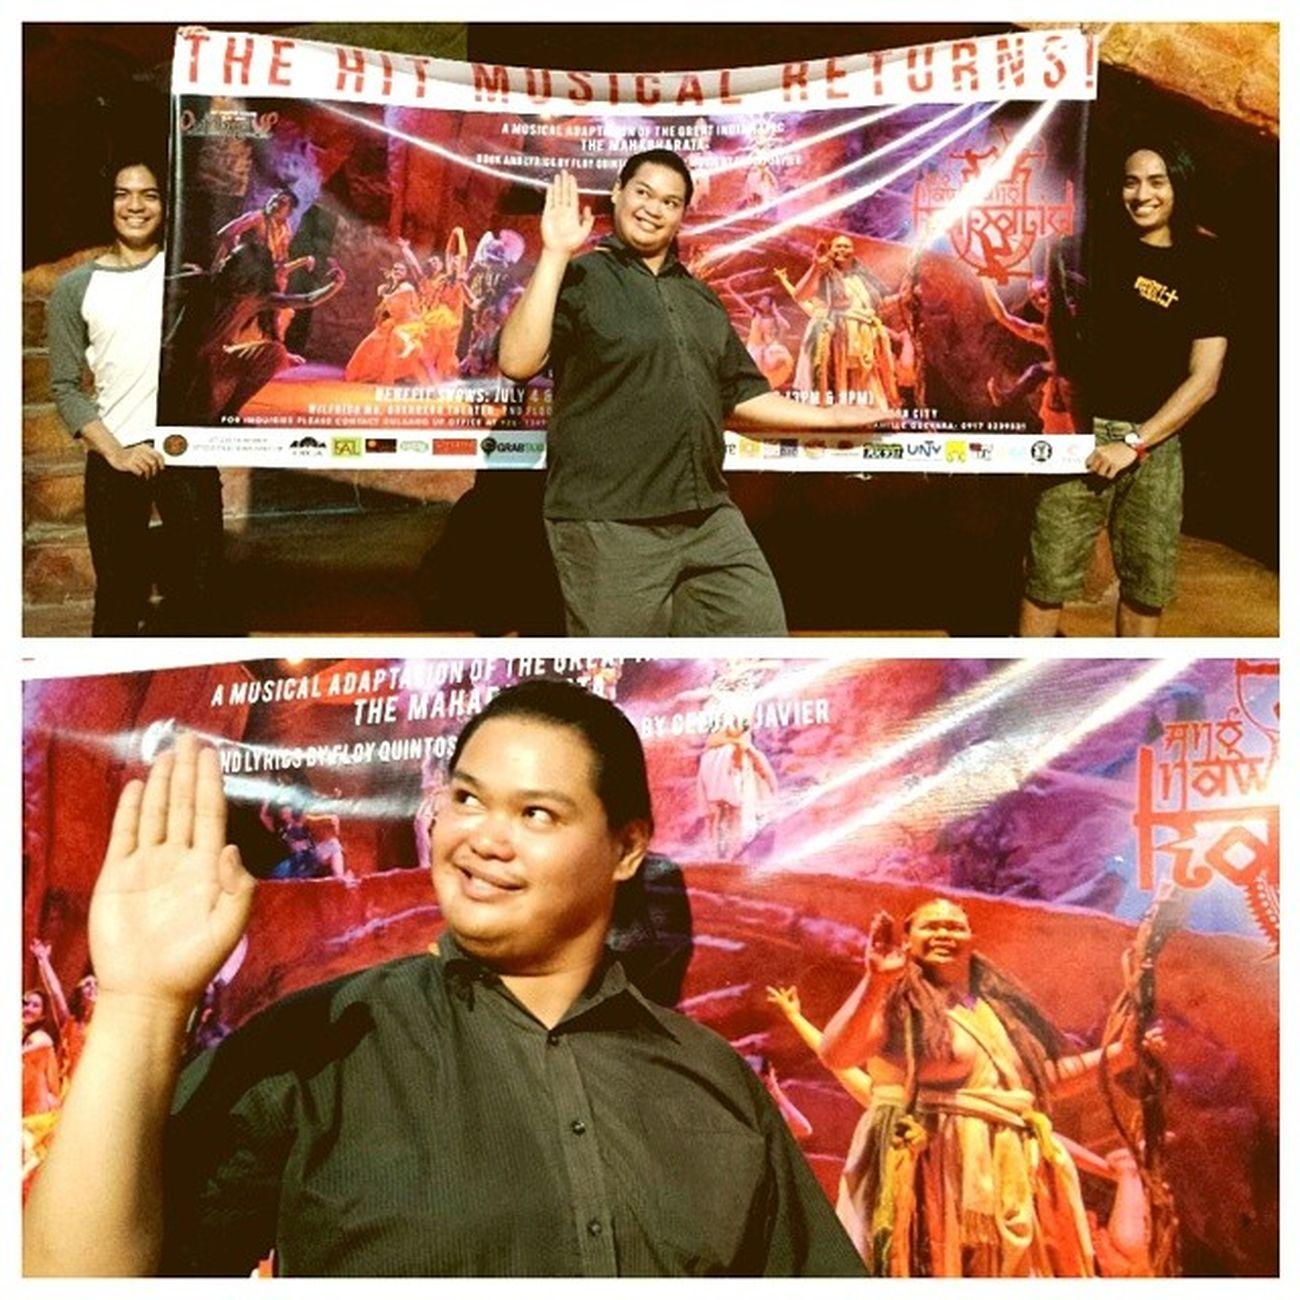 Jules dela Paz as Vyasa, invites ypu to watch the rerun of the hit musical, AngNawalangKapatid ! We open on Friday! InstaMagAndroid